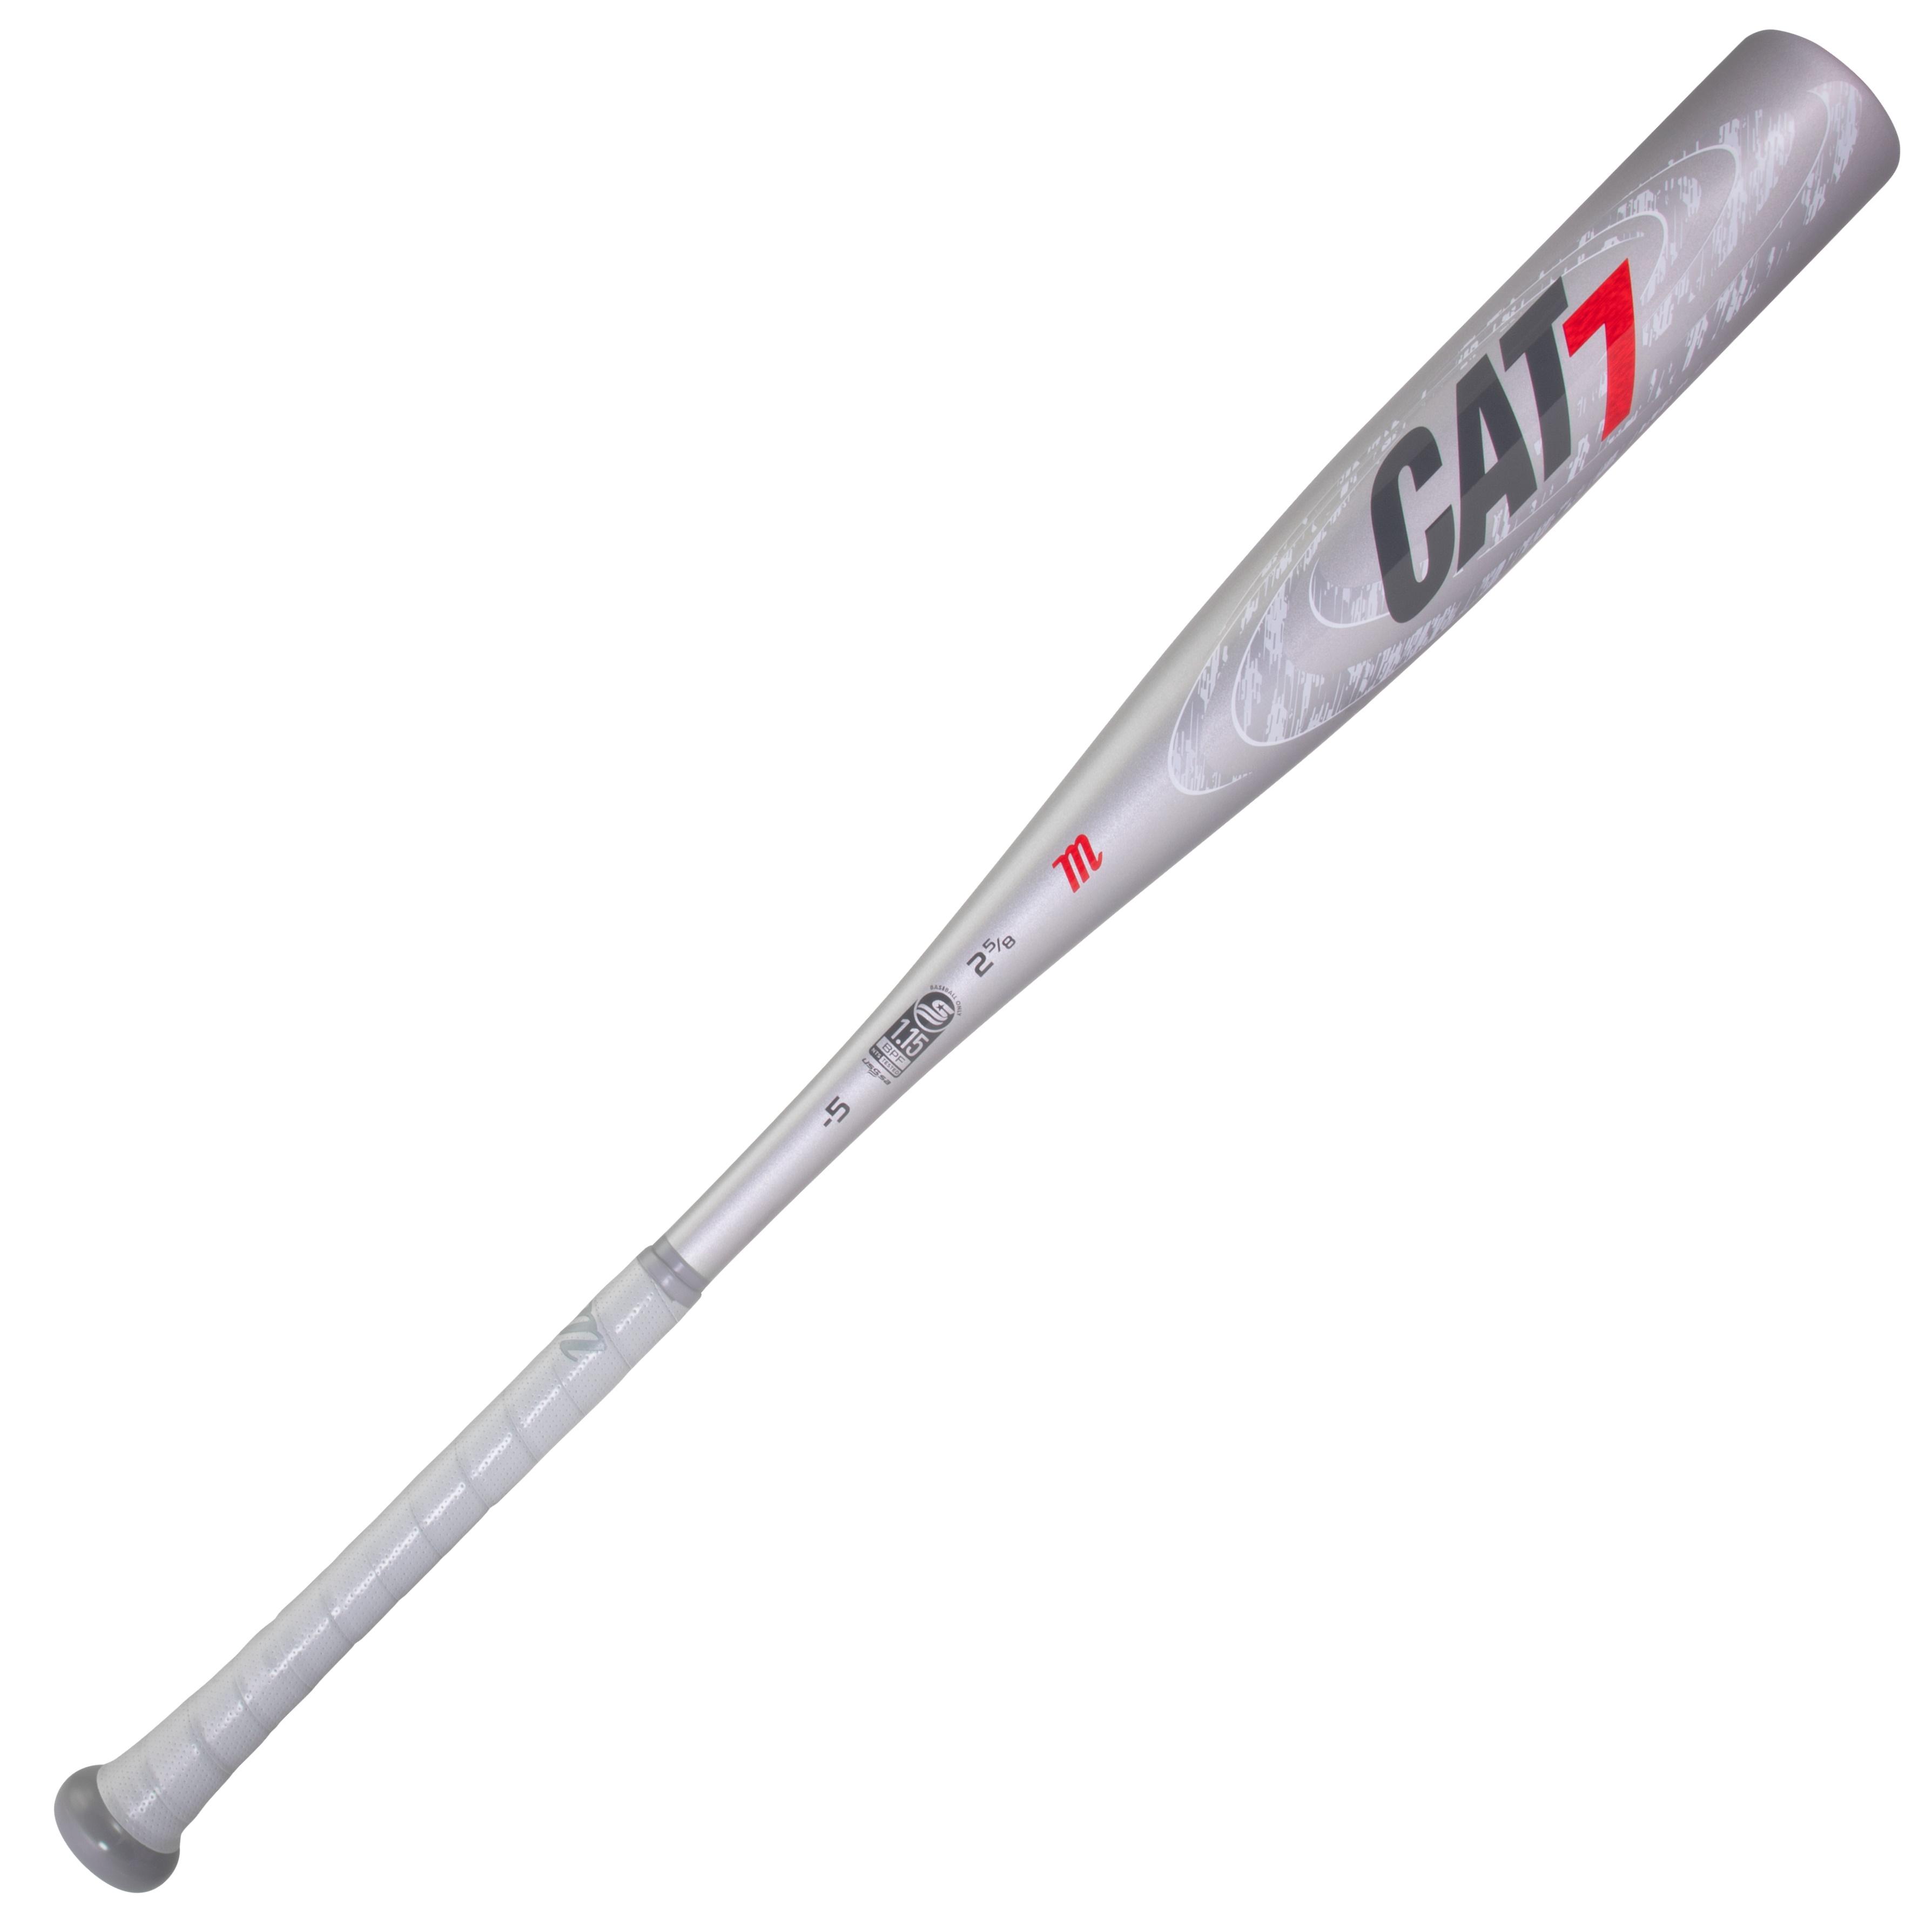 marucci-cat7-silver-5-baseball-bat-32-inch-27-oz MSBC725S-3227 Marucci